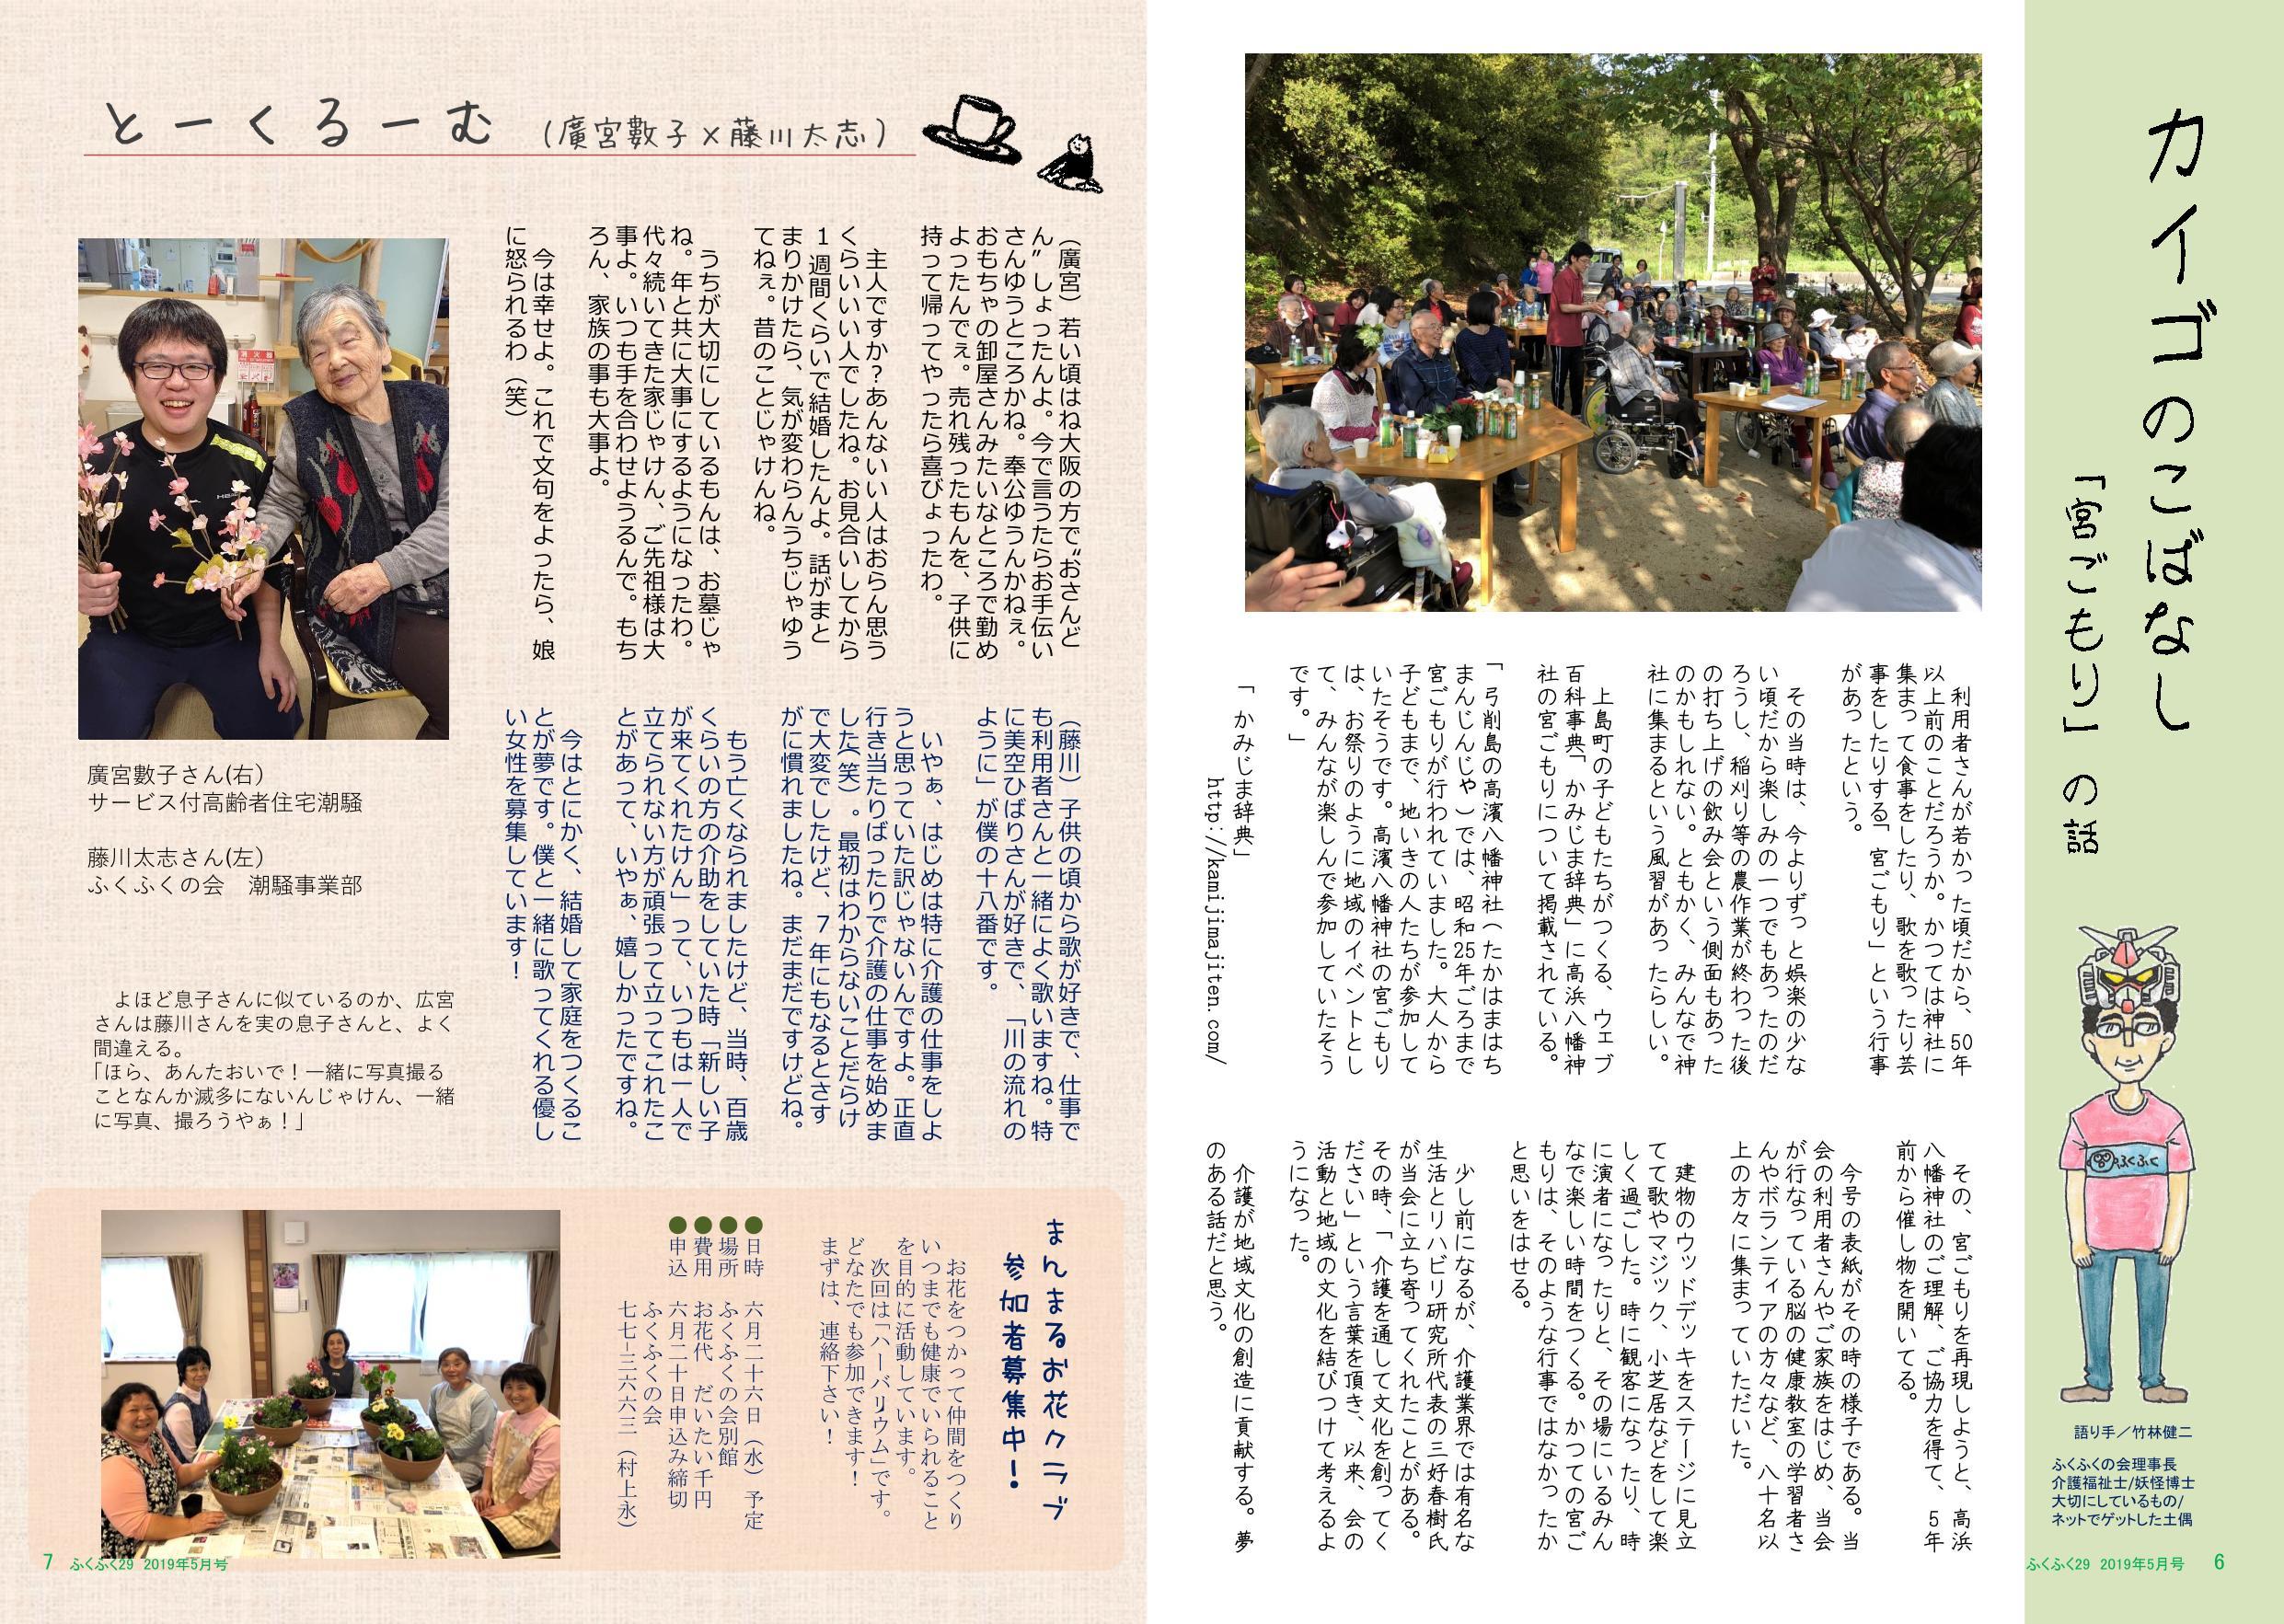 http://fukufukunokai.com/newsletter/images/%E3%81%B5%E3%81%8F%E3%81%B5%E3%81%8F29%E3%80%802019%E3%80%805%E6%9C%88%E5%8F%B7_cropped_4.jpeg